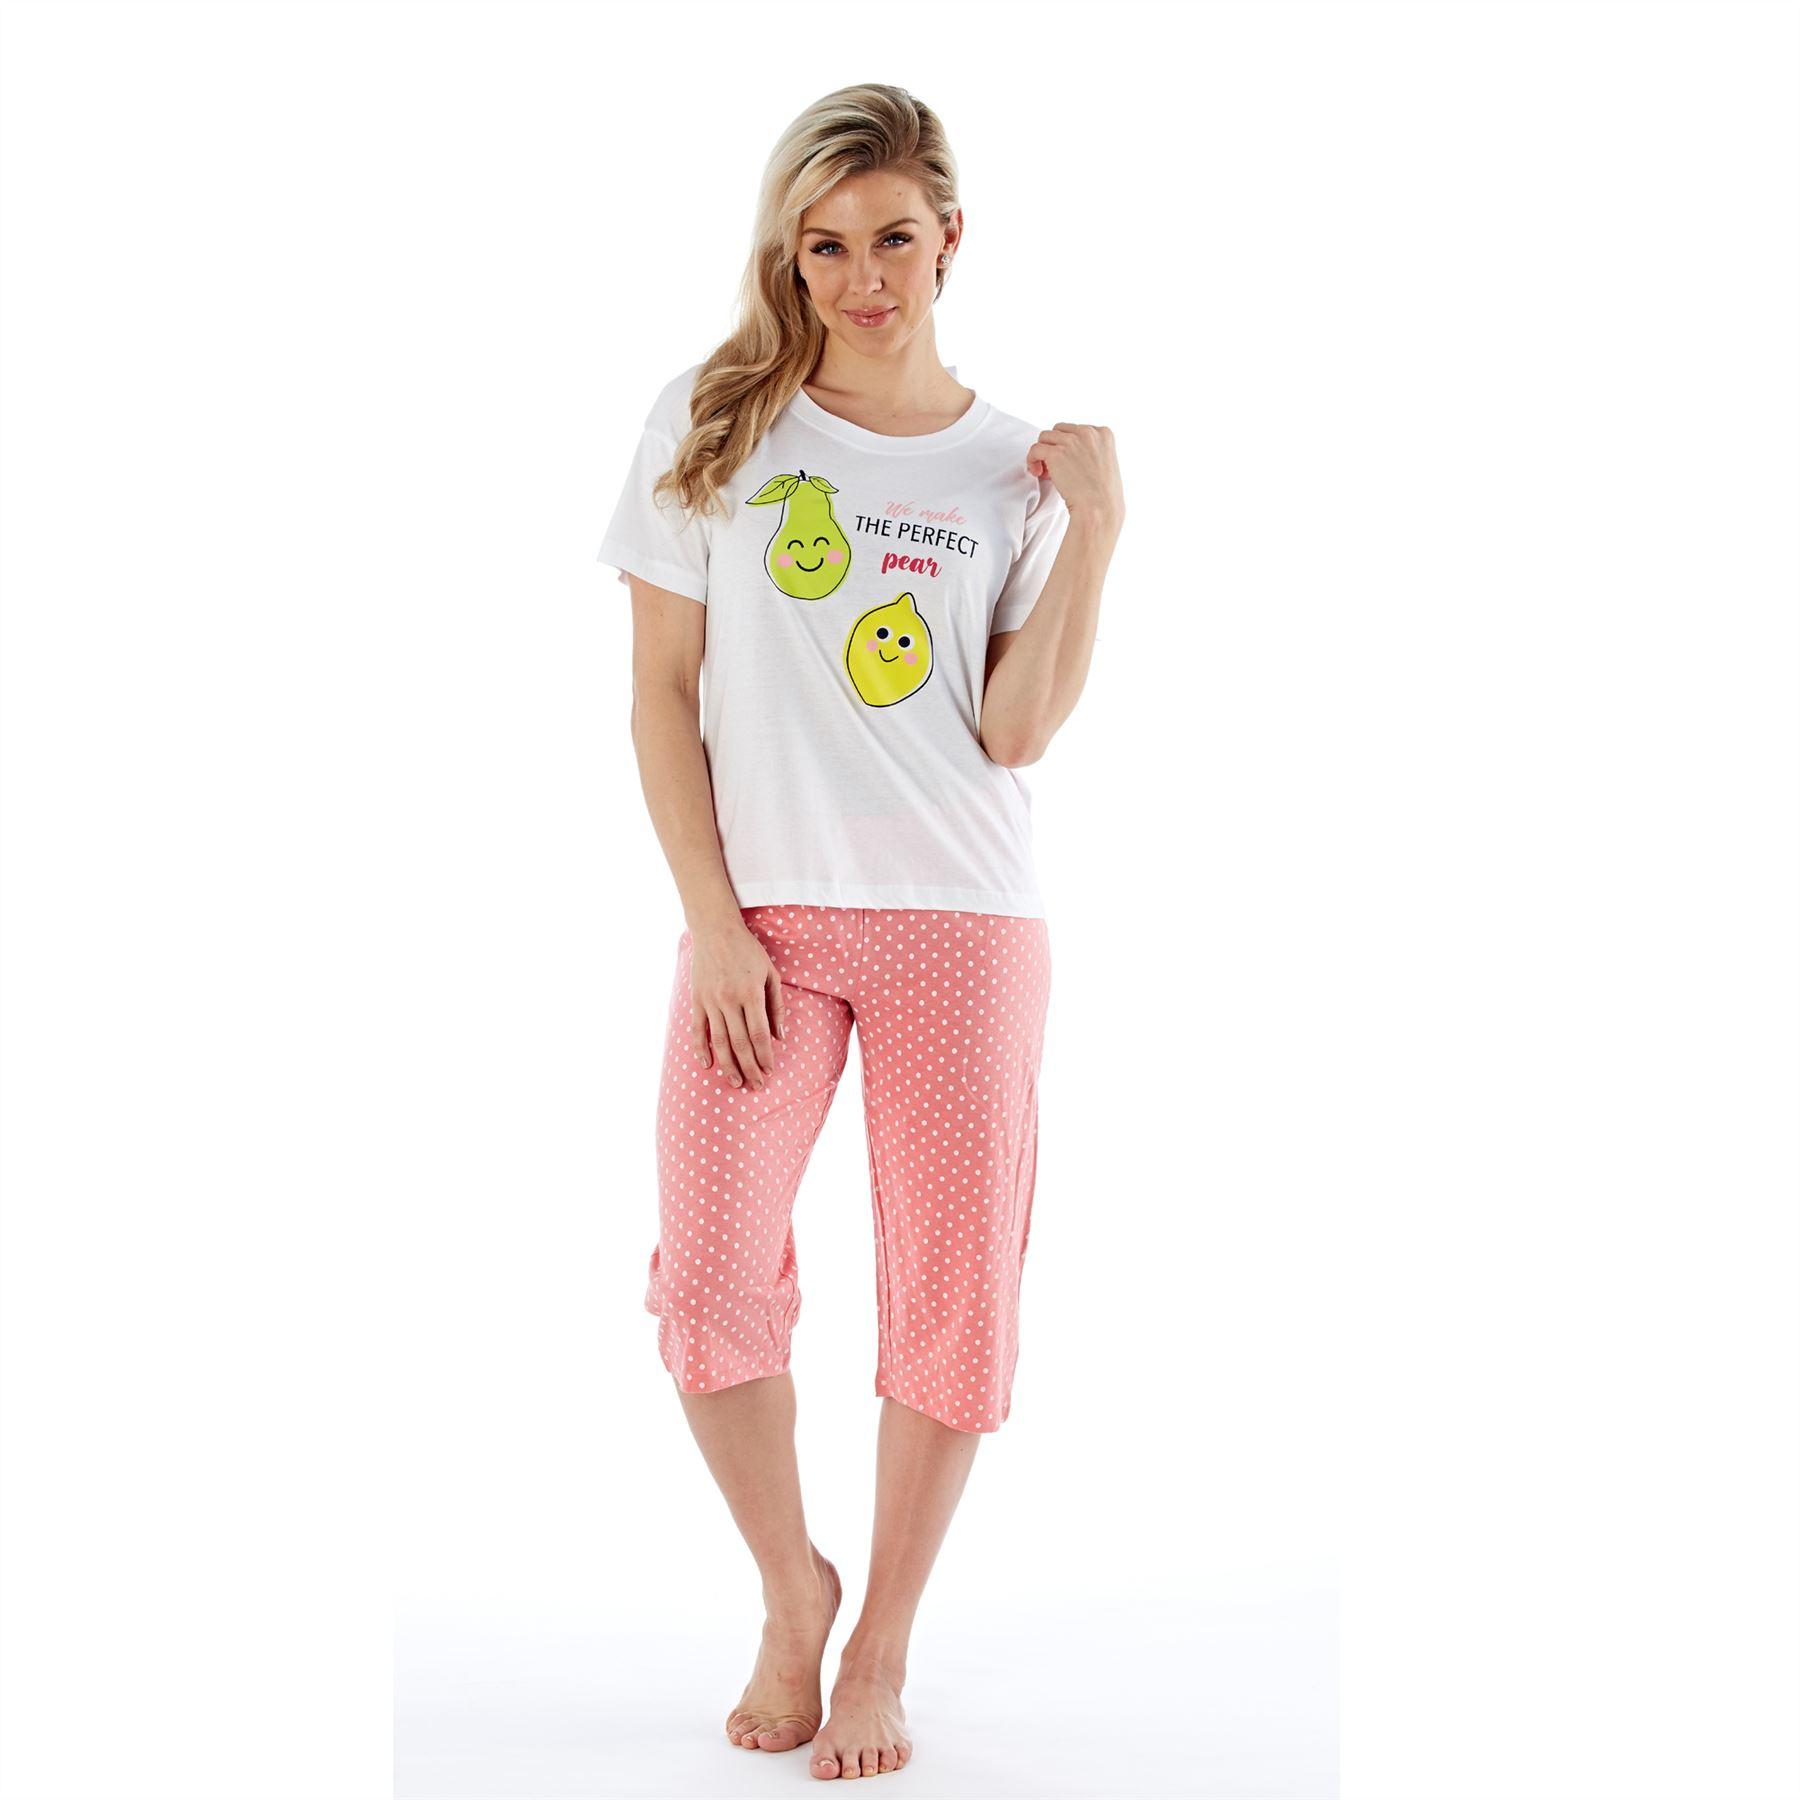 Womens-Ladies-Cotton-Pyjamas-Pyjama-PJs-Summer-Nightwear-Set-Size-8-18-NEW thumbnail 27